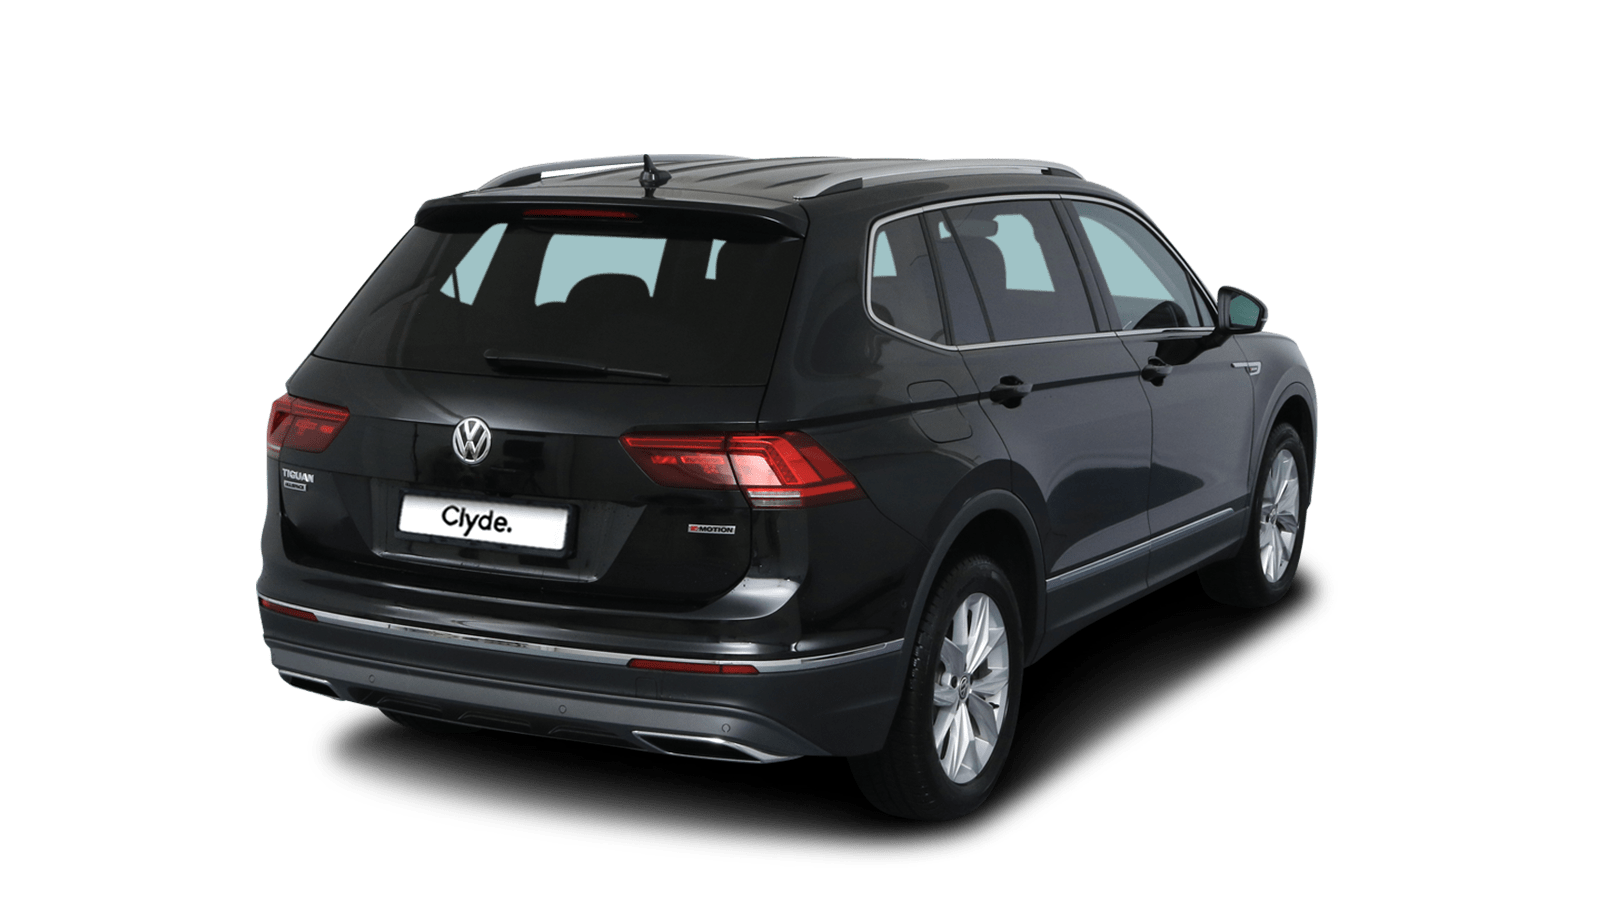 VW Tiguan Allspace Black front - Clyde car subscription